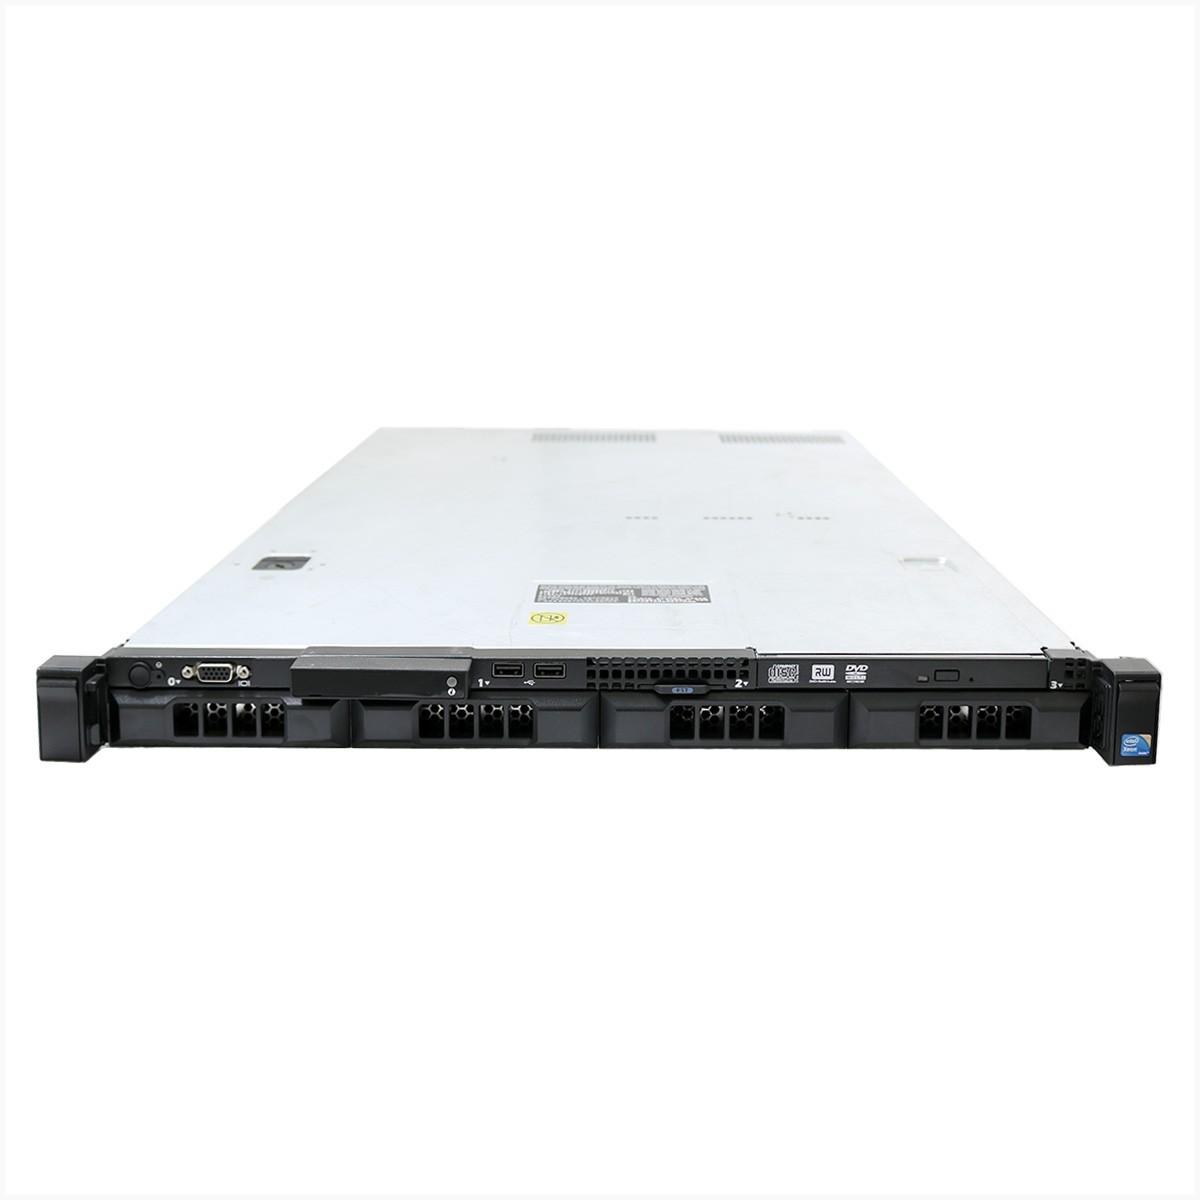 Servidor dell r310 2x intel xeon x3430 8gb 1tb - usado